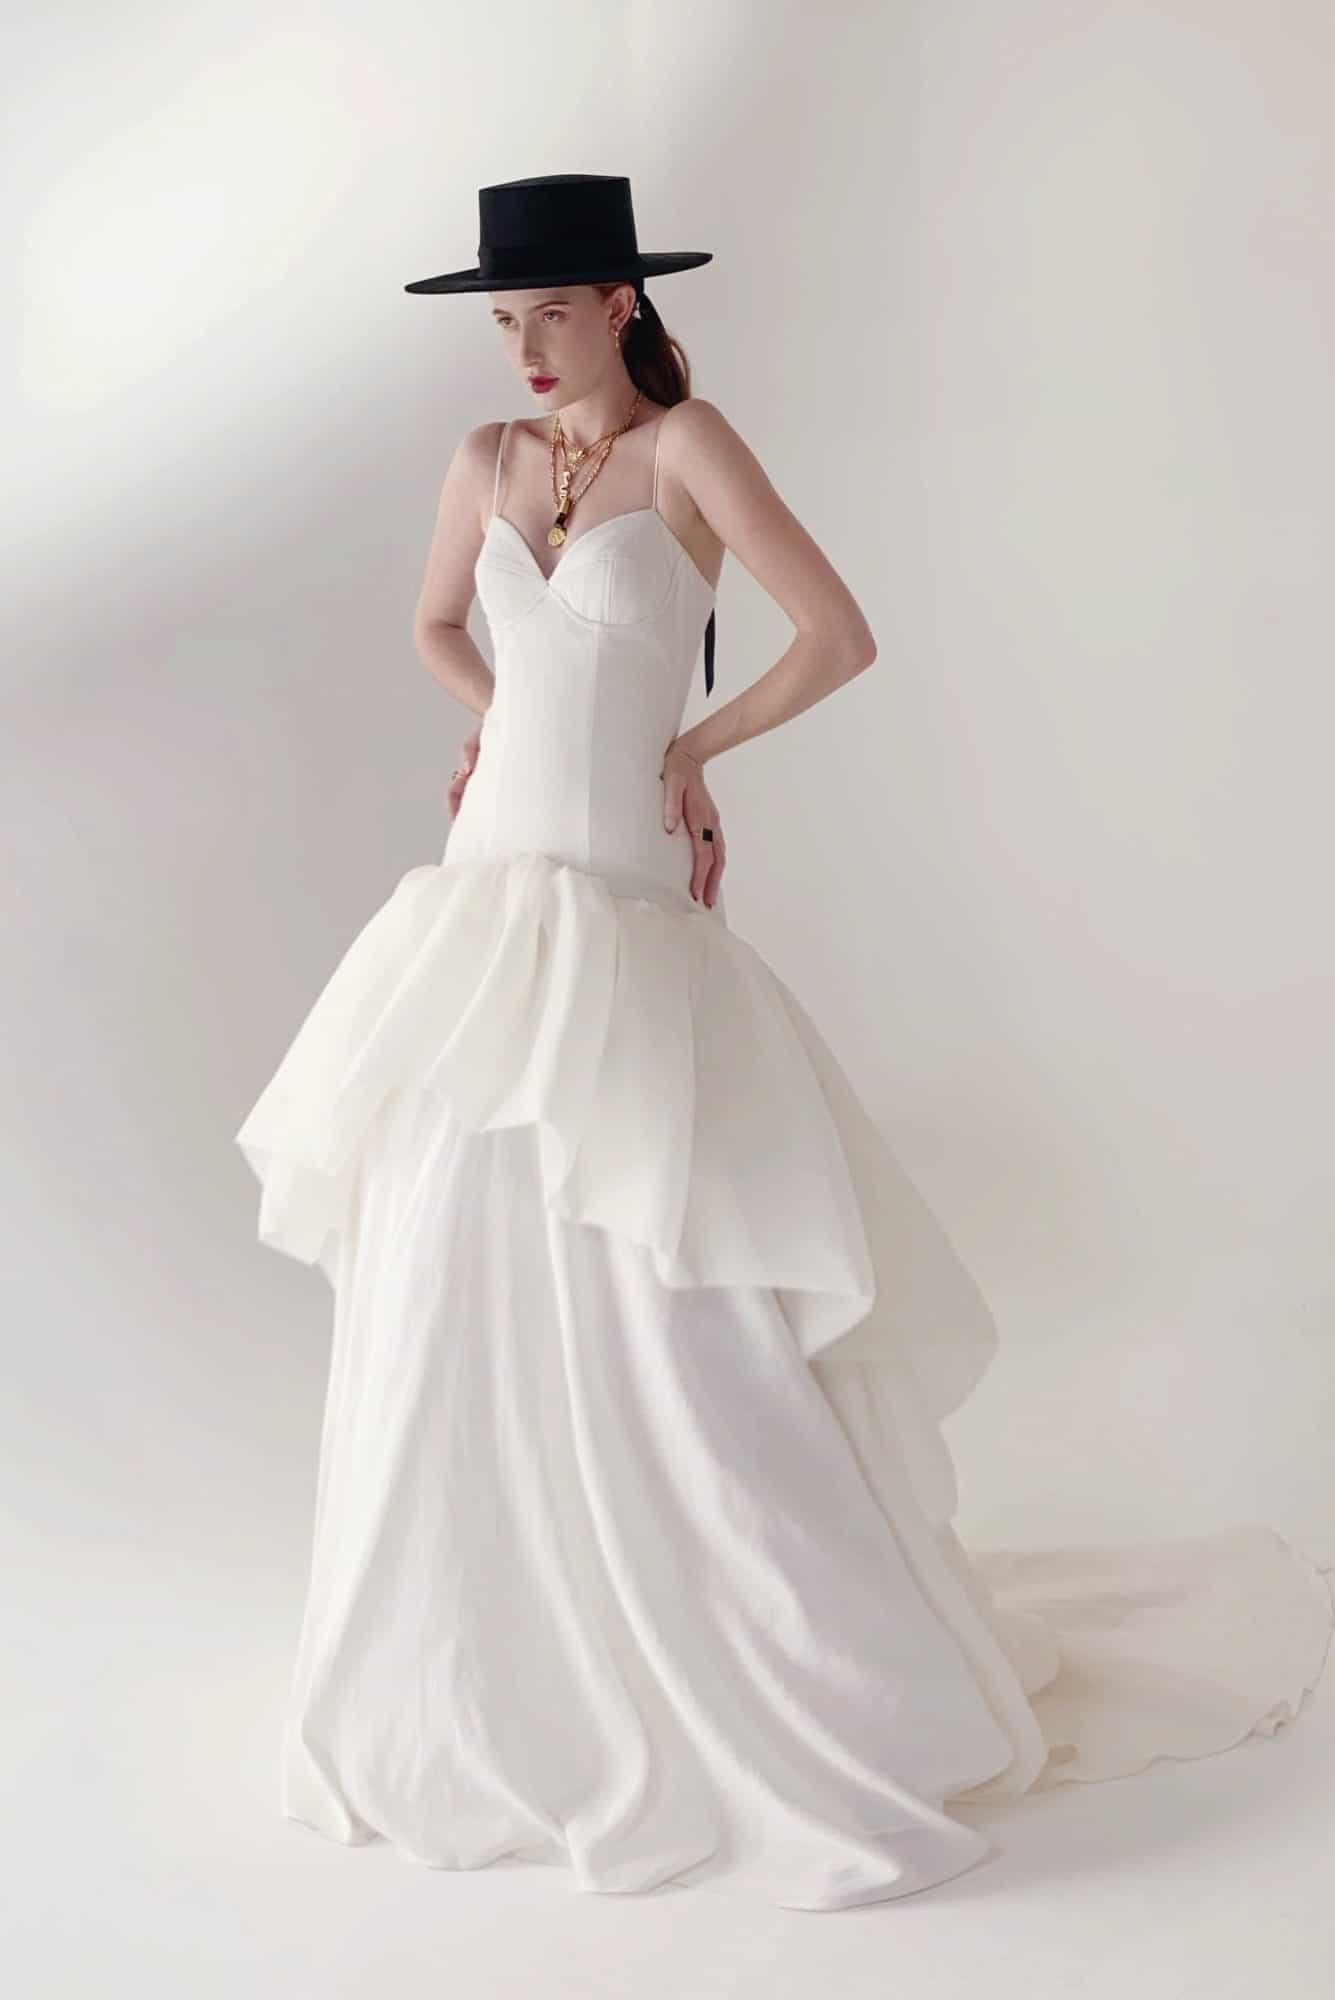 wedding dresses by Odylyne the ceremony